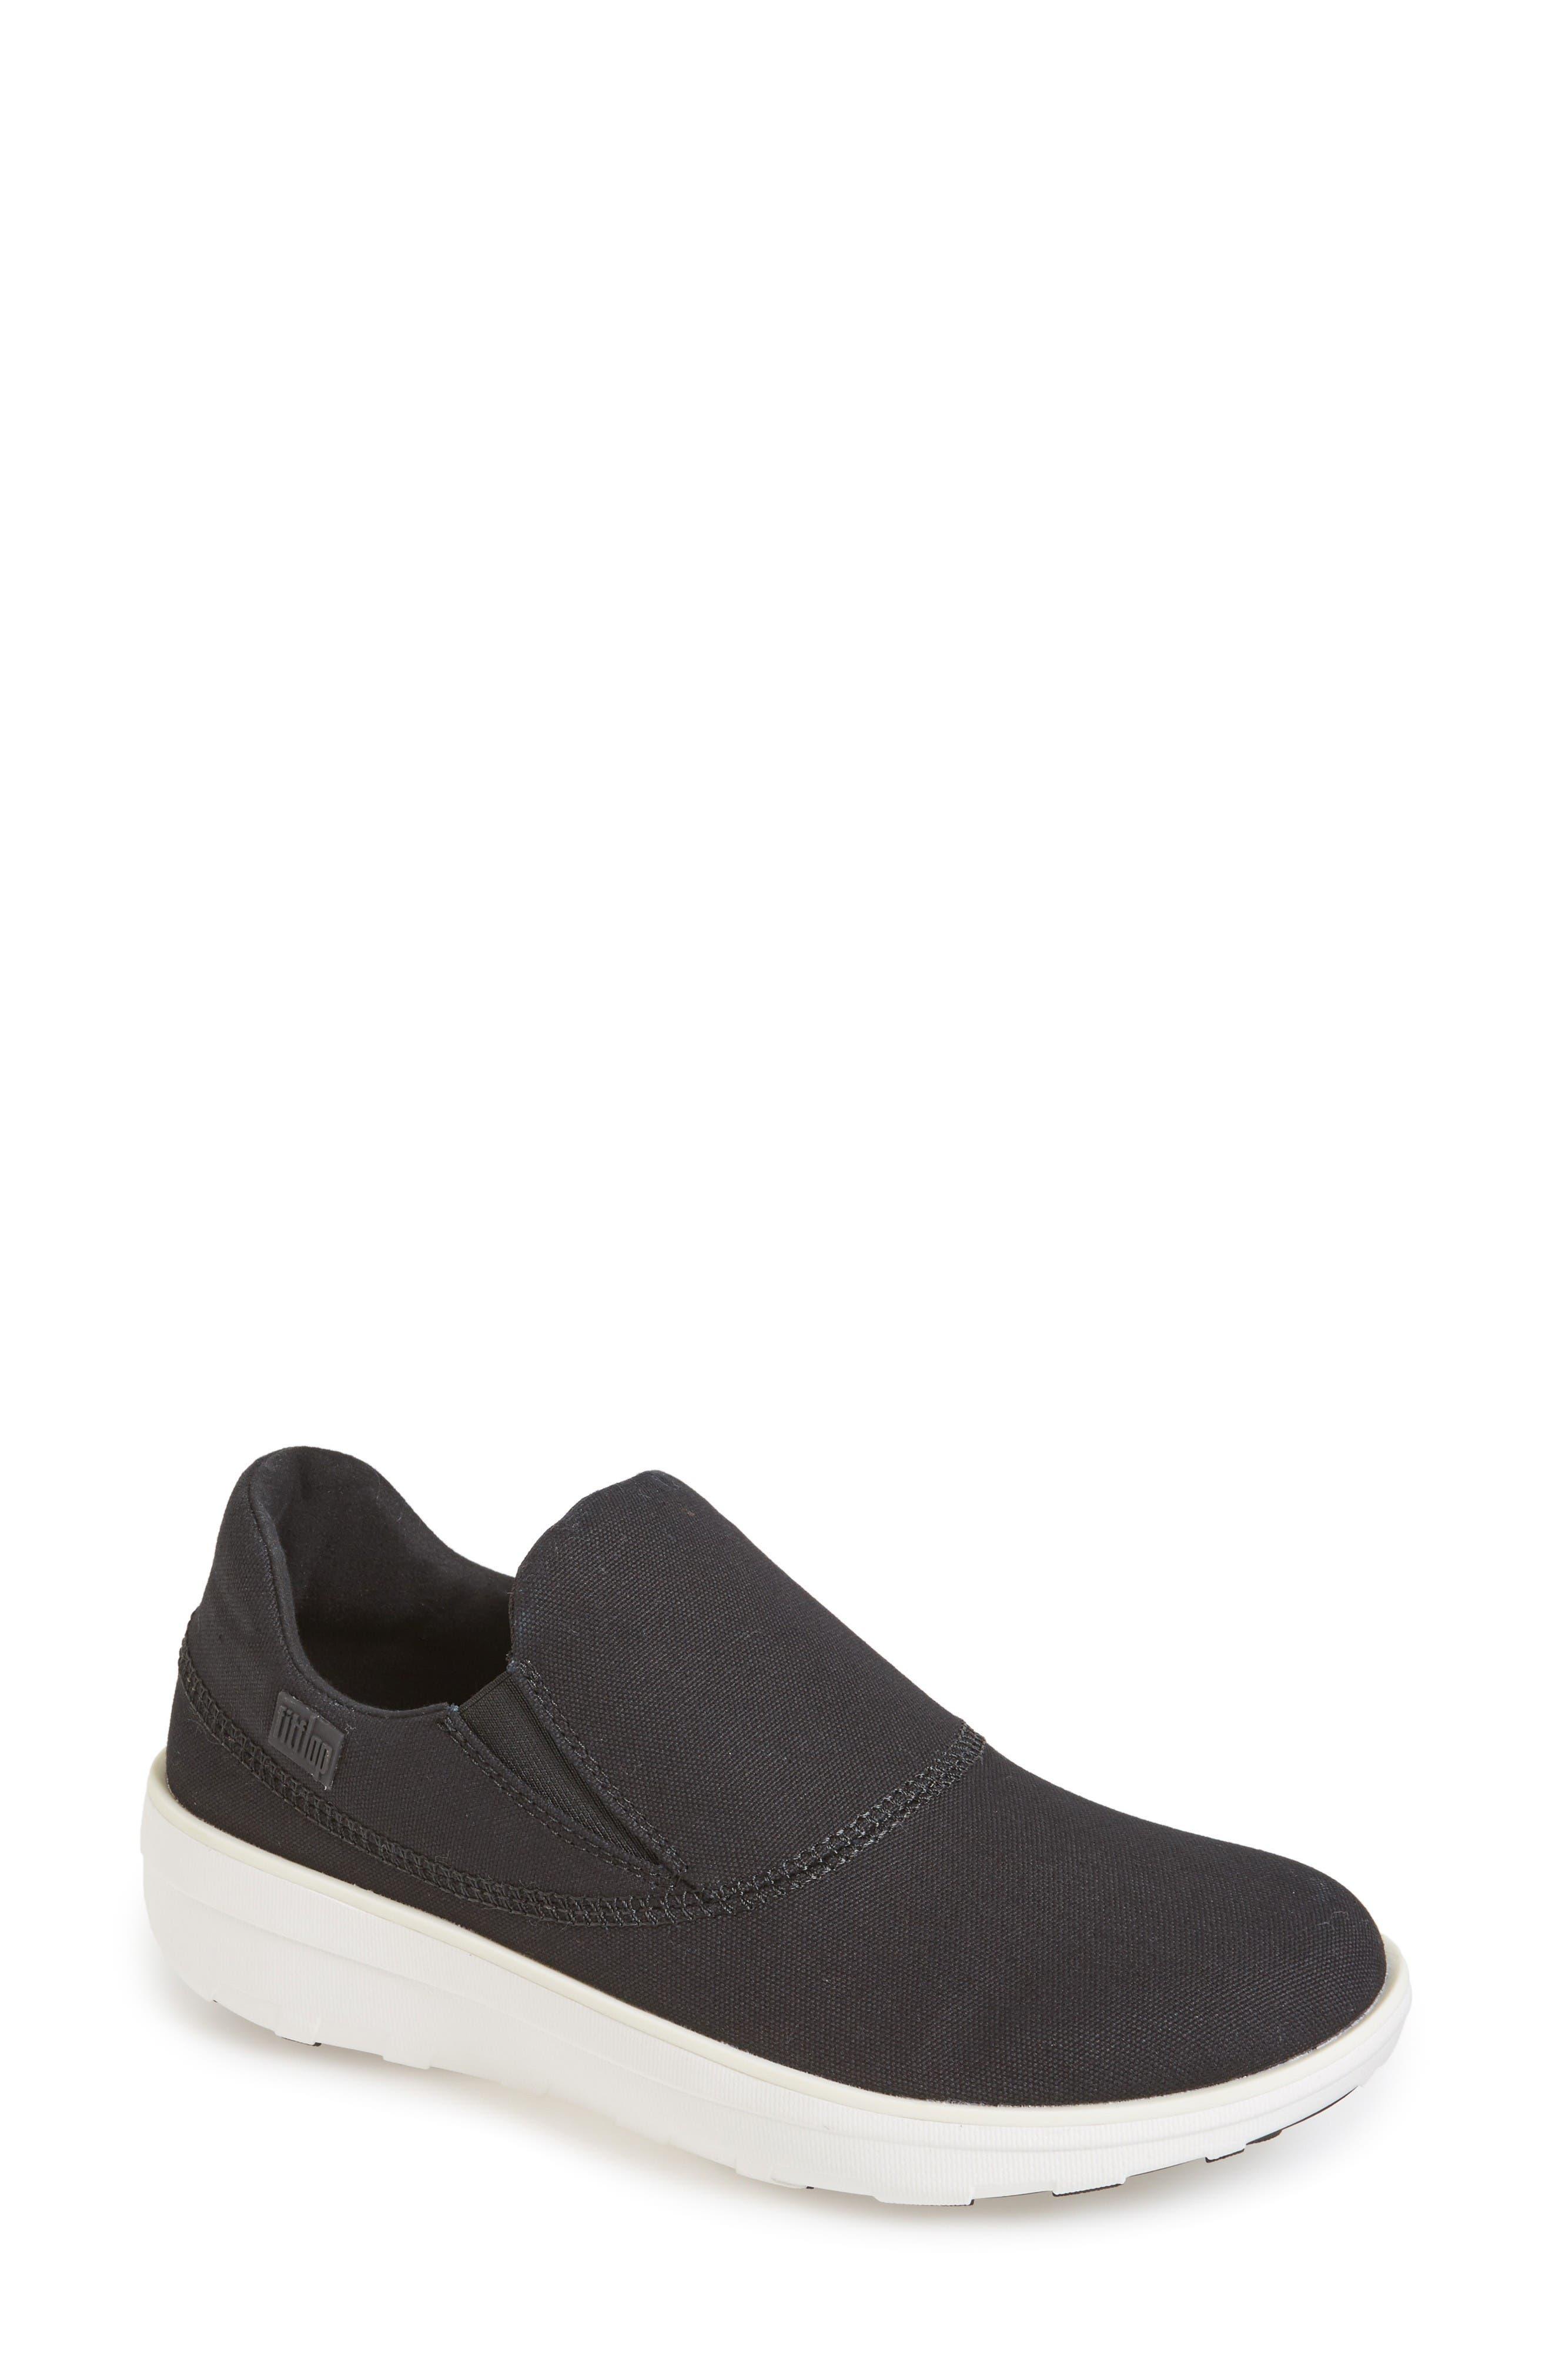 Main Image - FitFlop Loaff Slip-On Sneaker